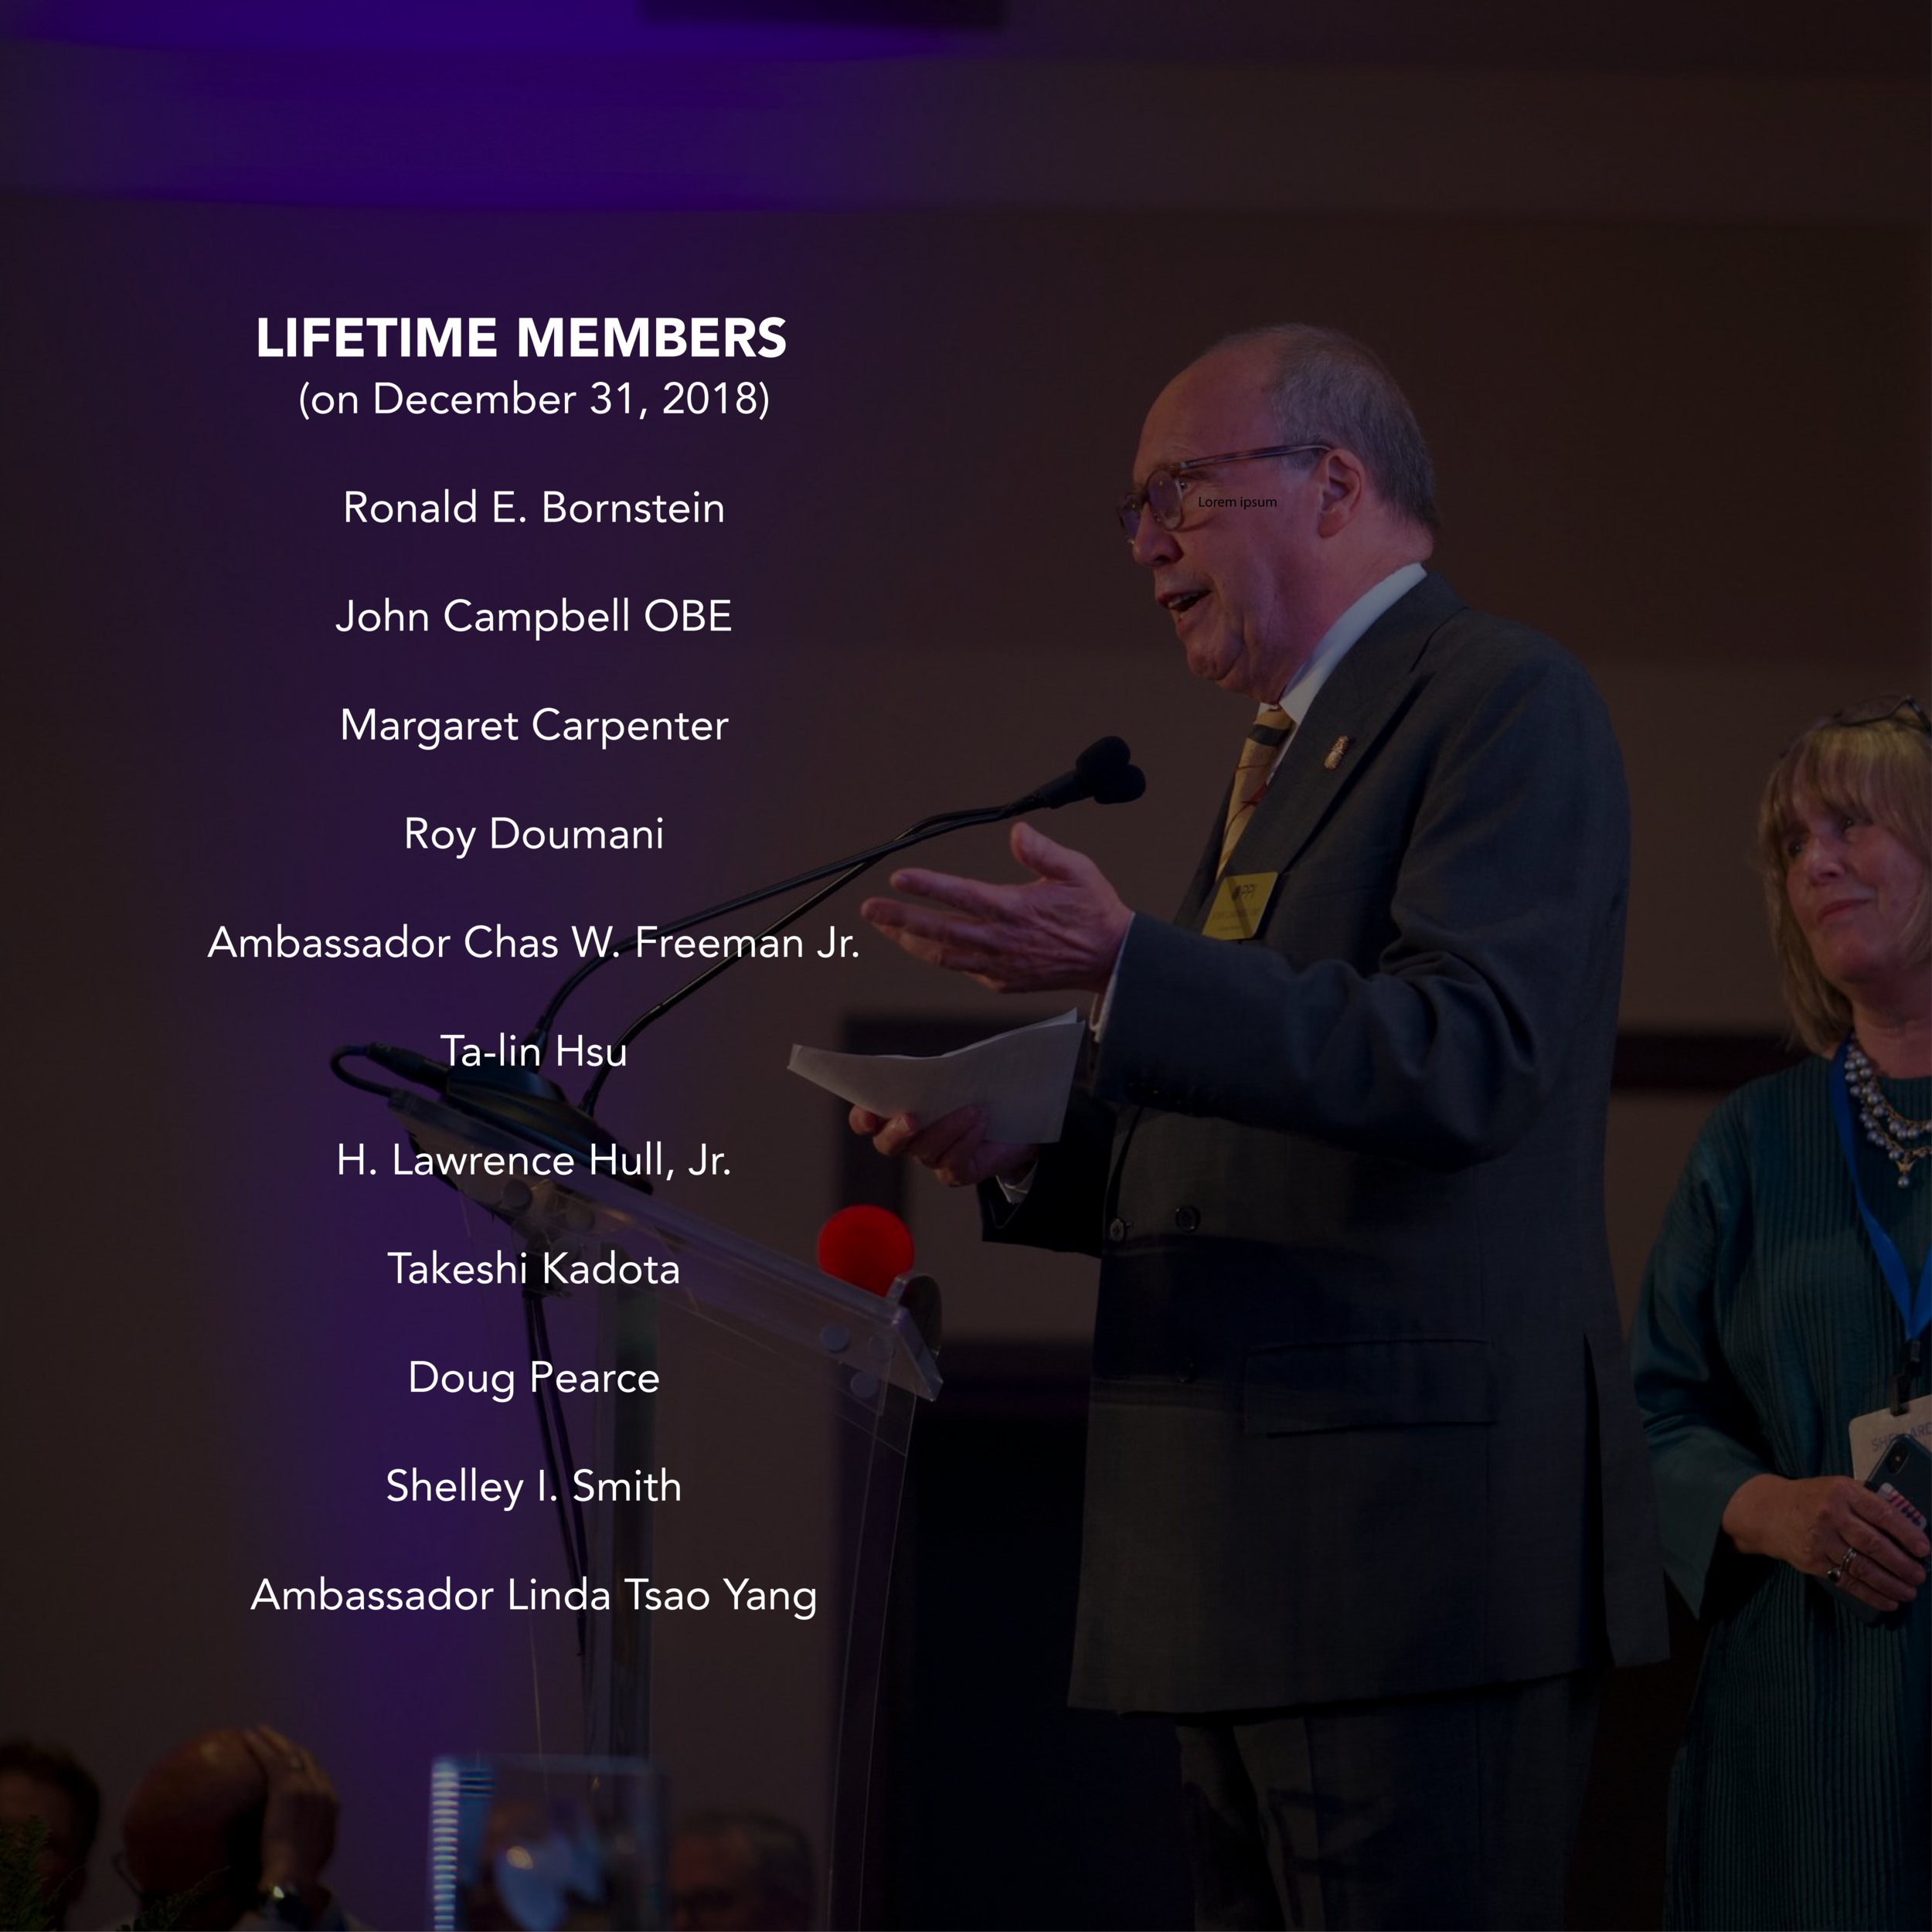 Lifetime Members